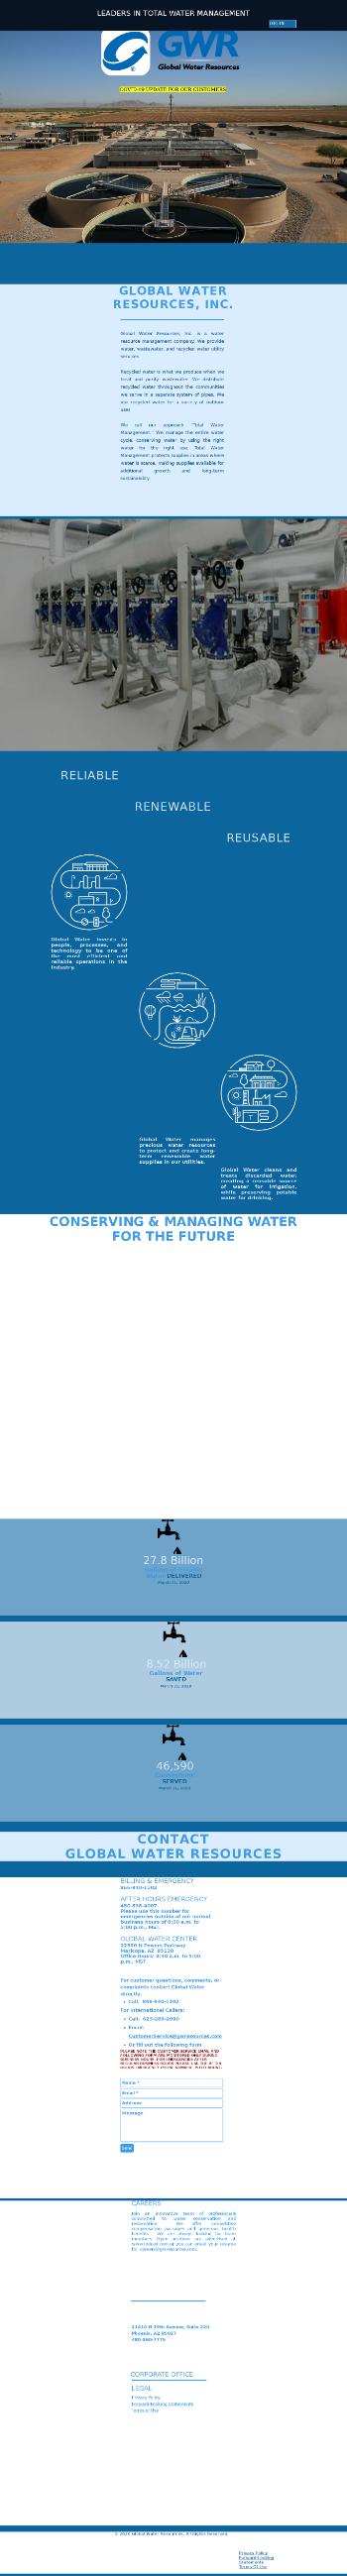 Global Water Resources, Inc. Website Screenshot